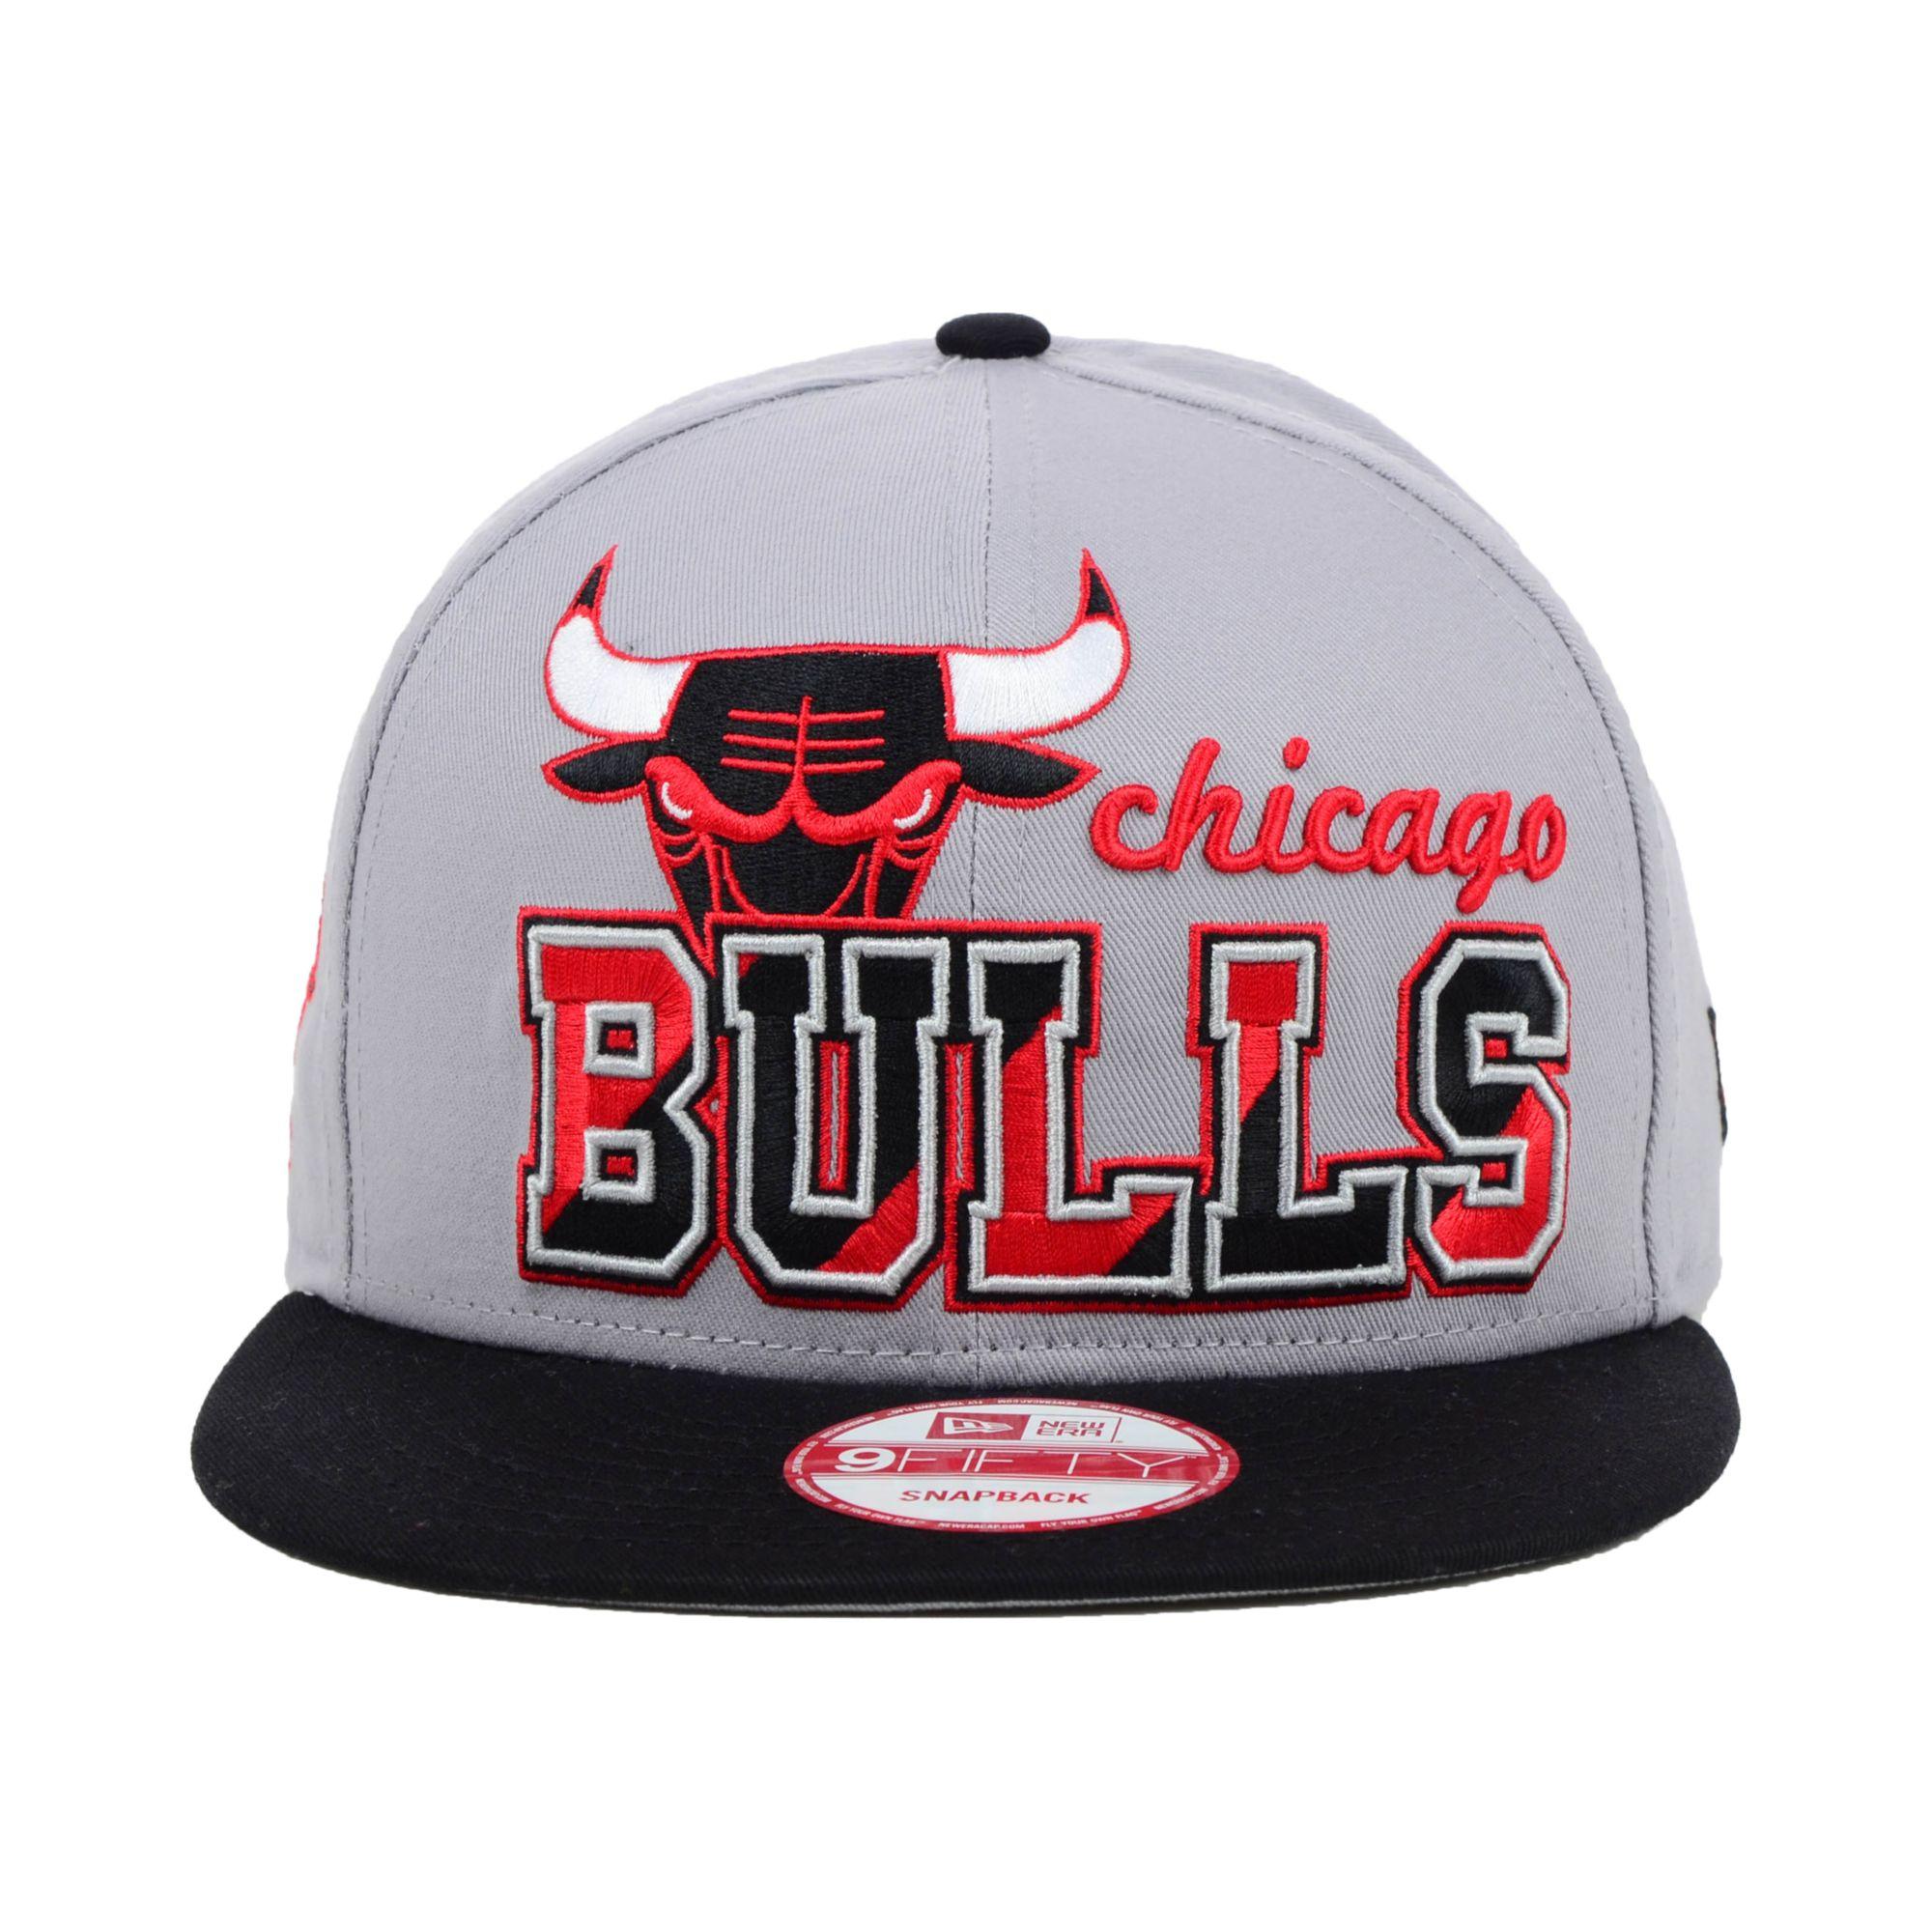 1be15ff98a4 Lyst - KTZ Chicago Bulls Nba Hardwood Classics Zone Press 9Fifty ...